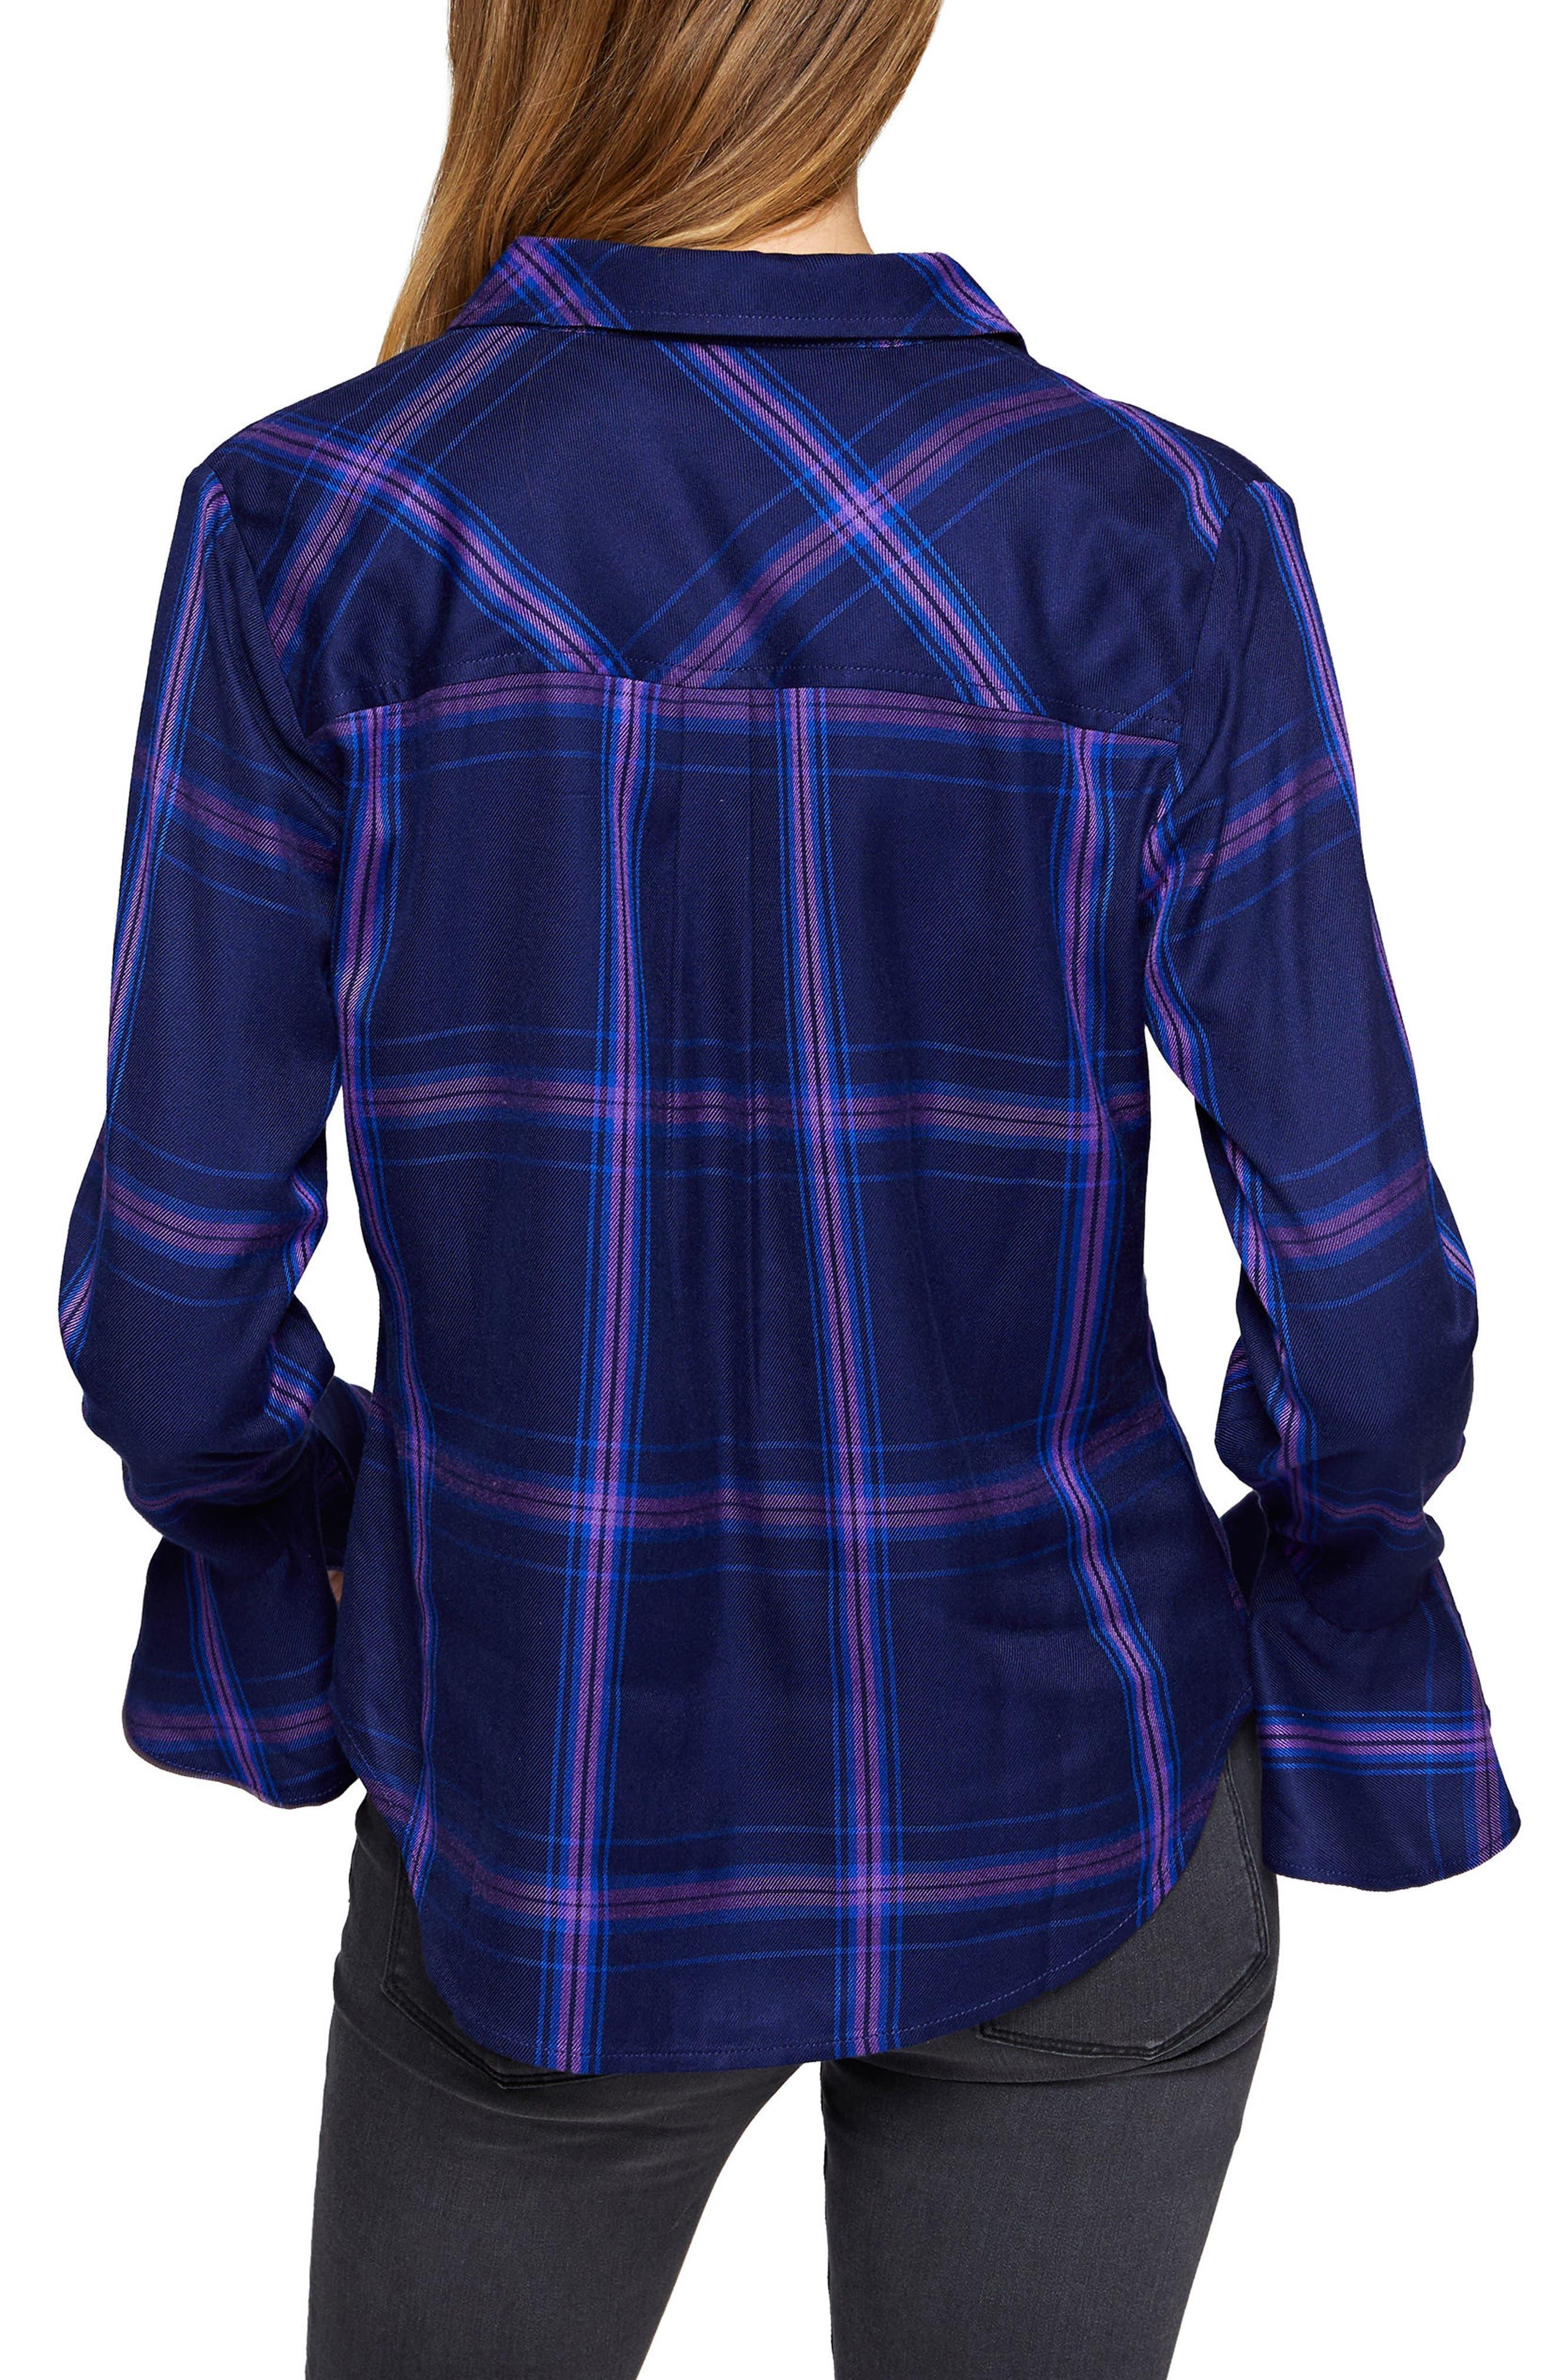 Nightscape Shirt,                             Alternate thumbnail 2, color,                             496